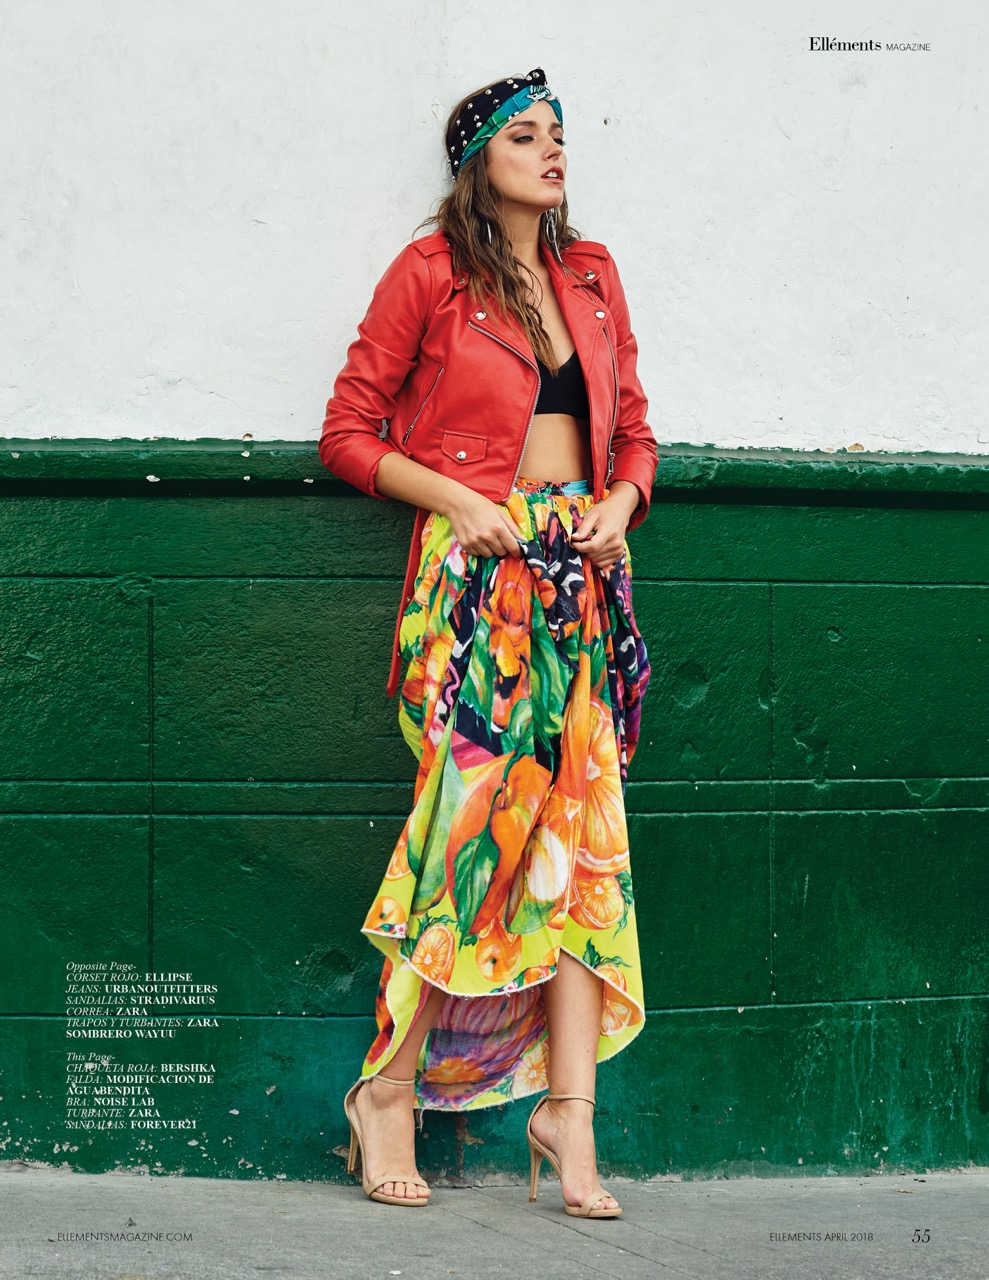 201804-EllementsMagazine-09.jpg